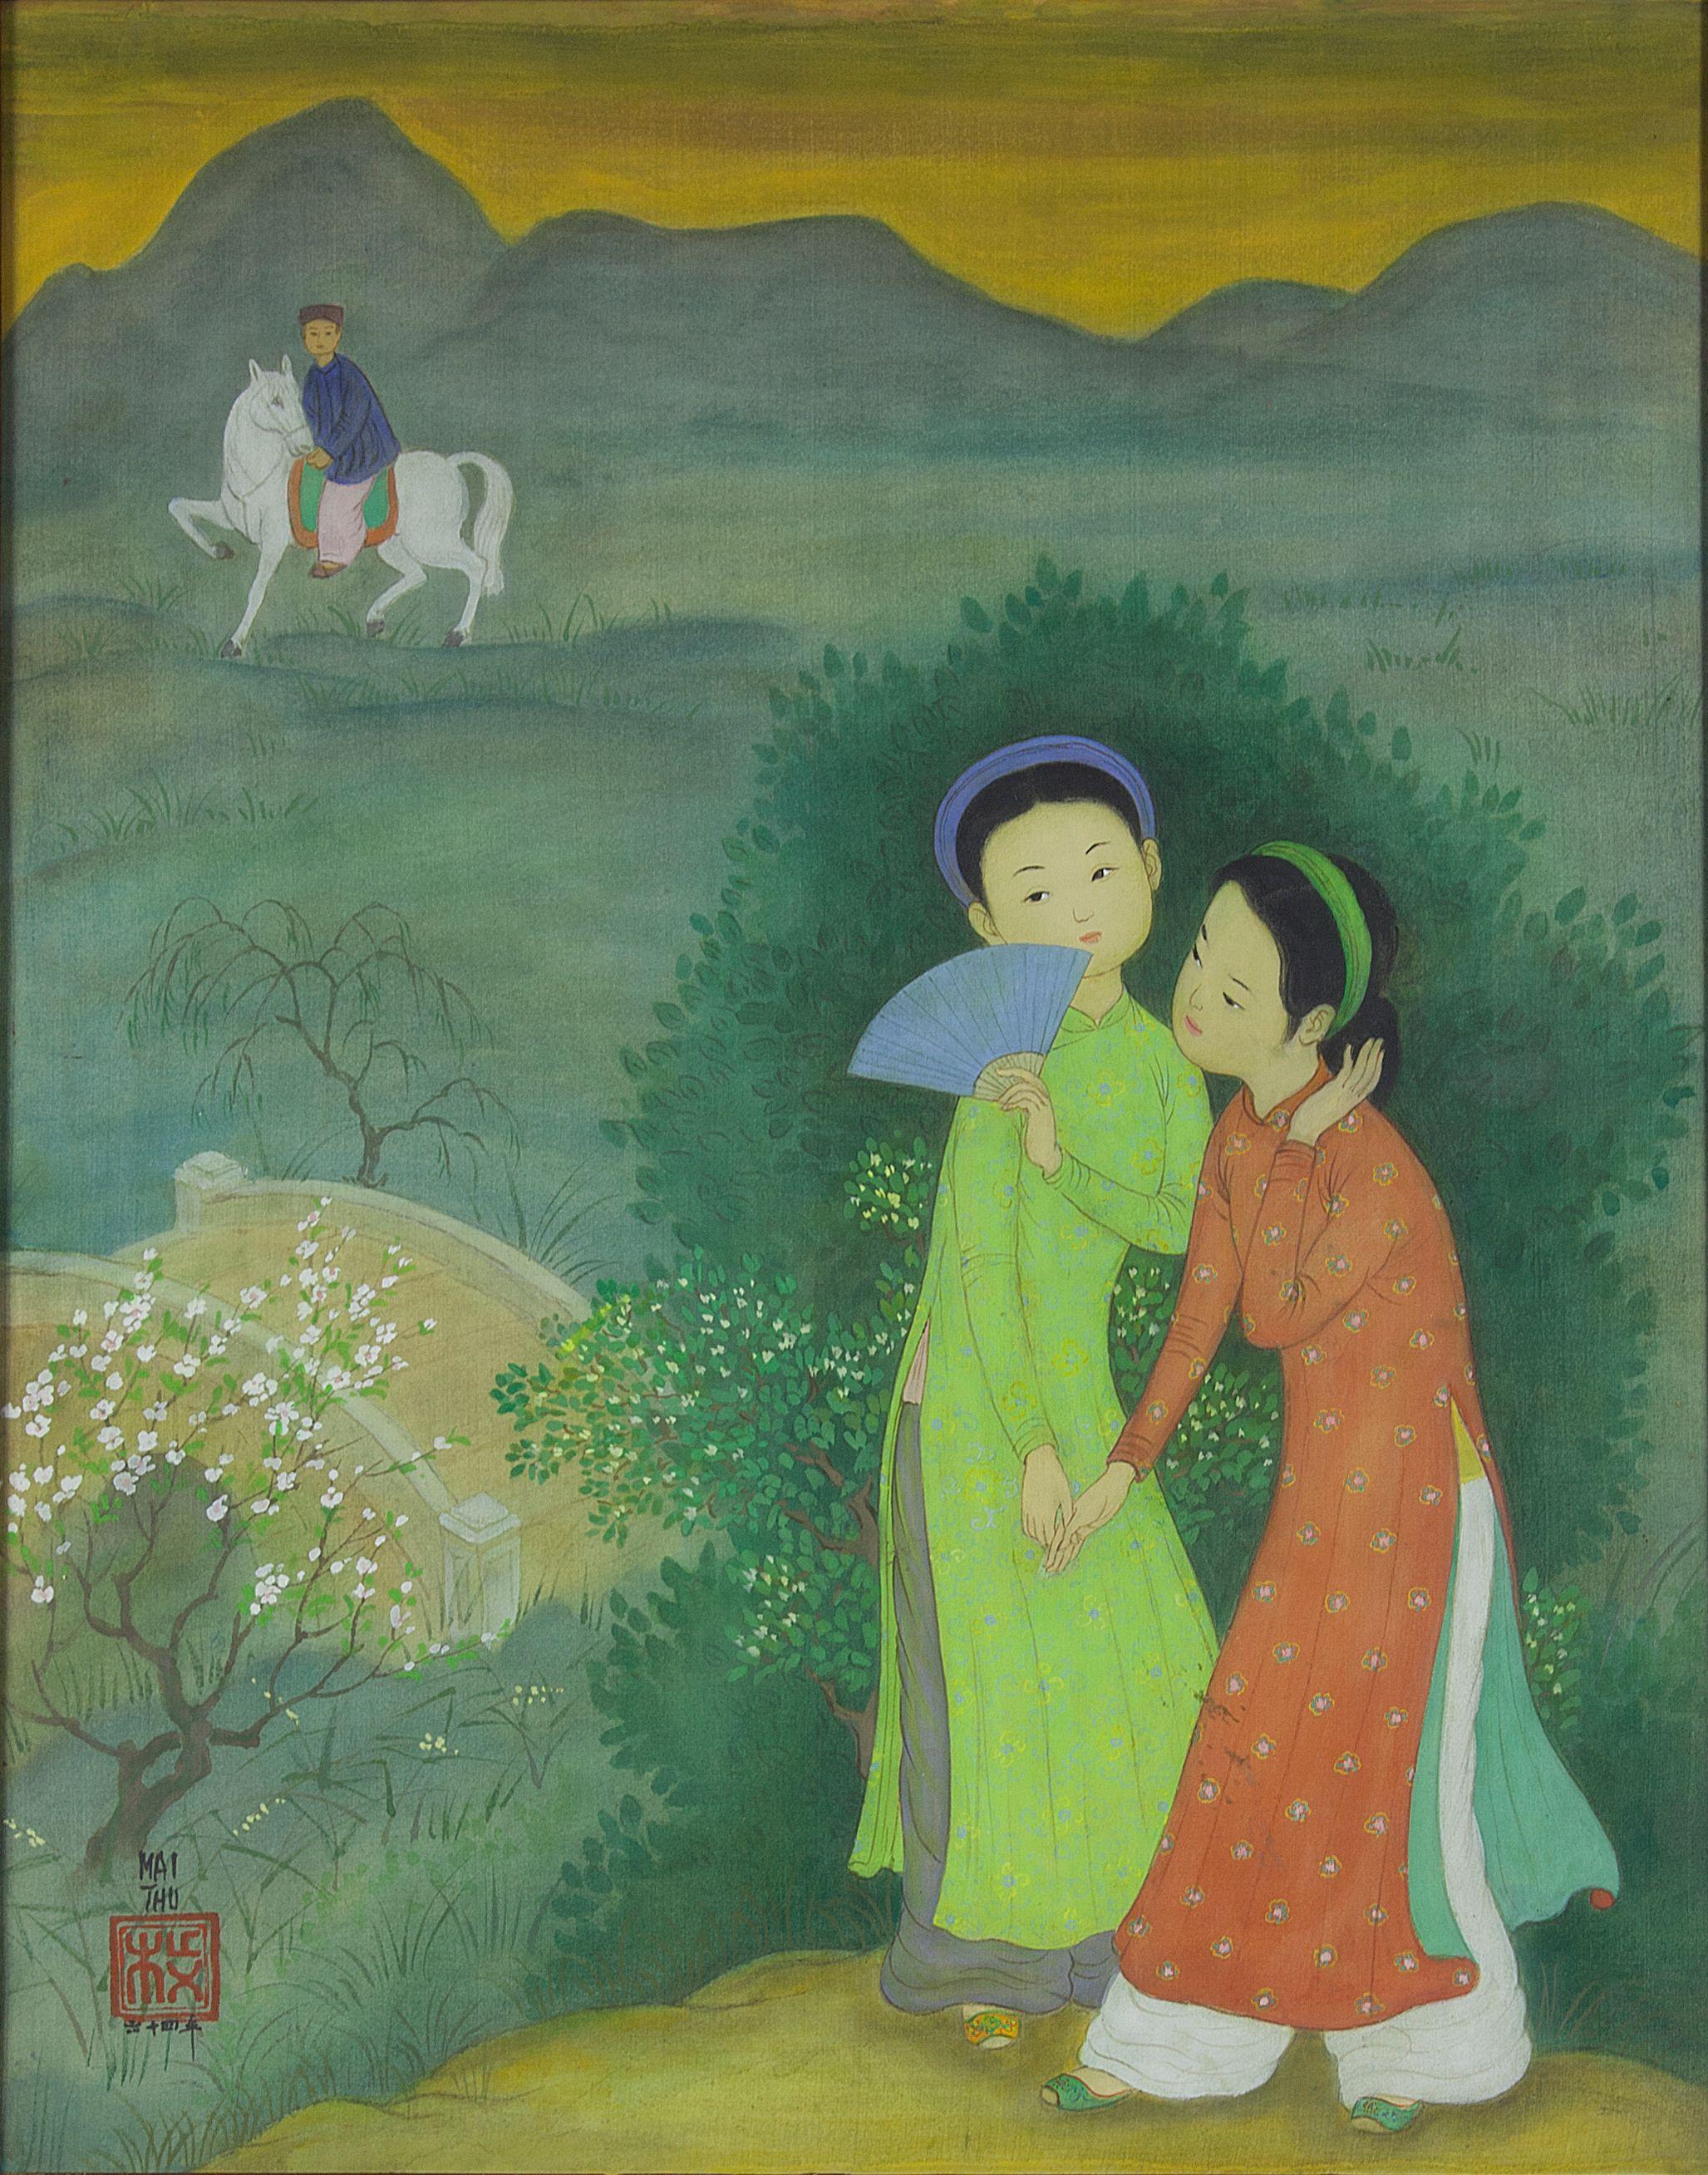 Srihadi Soedarsono, Legong Lasem (Two Dancers), 1986, 100 x 135 cm